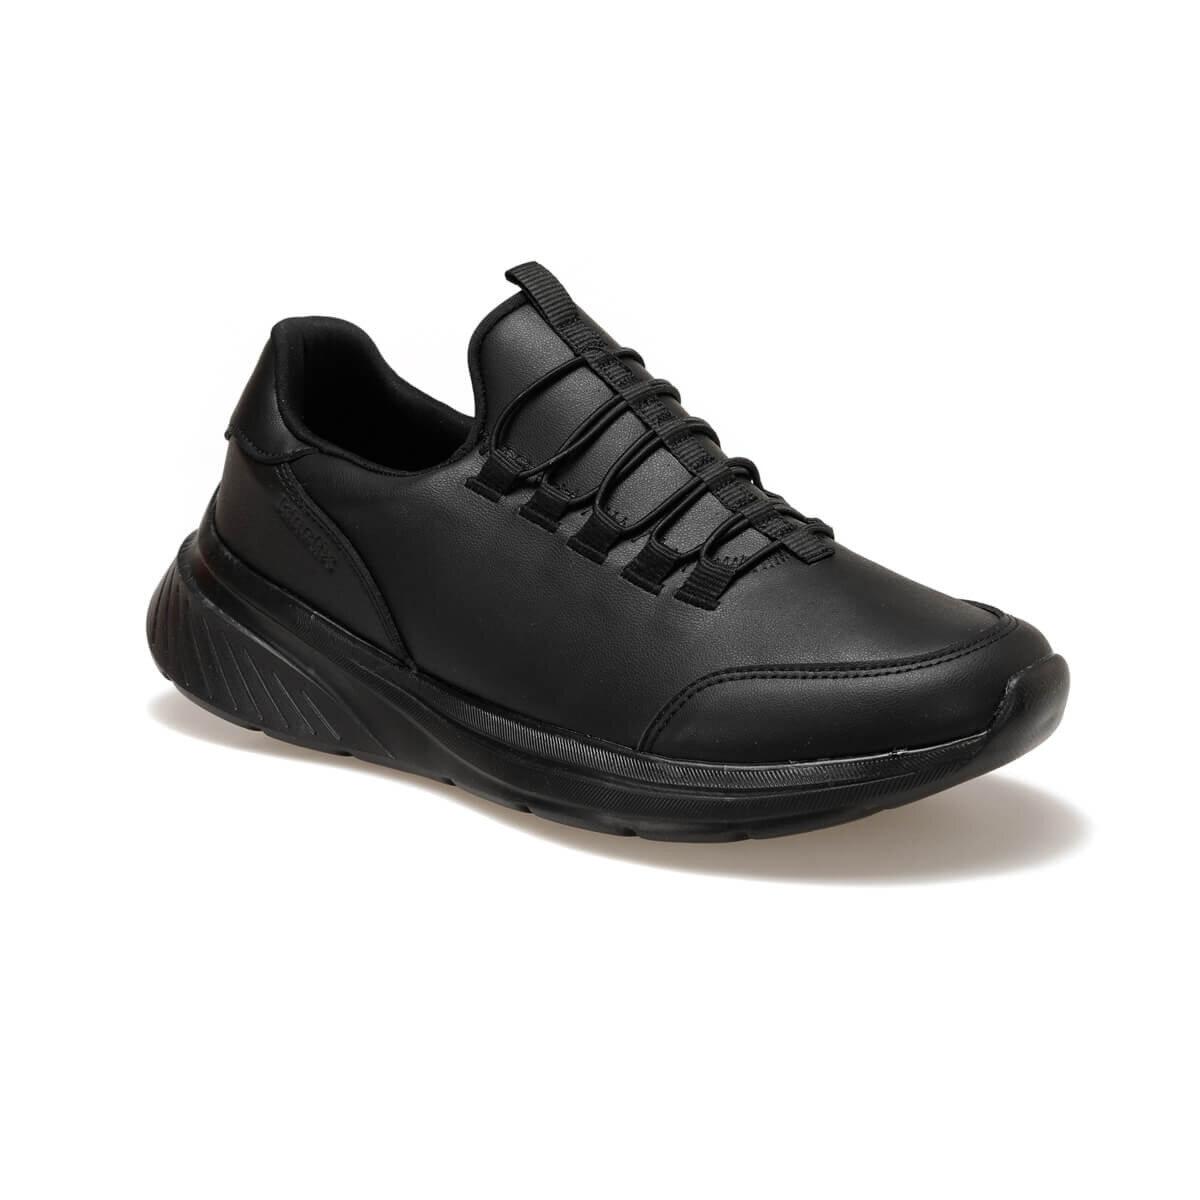 FLO PLAZO PU 9PR Black Men 'S Comfort Shoes KINETIX